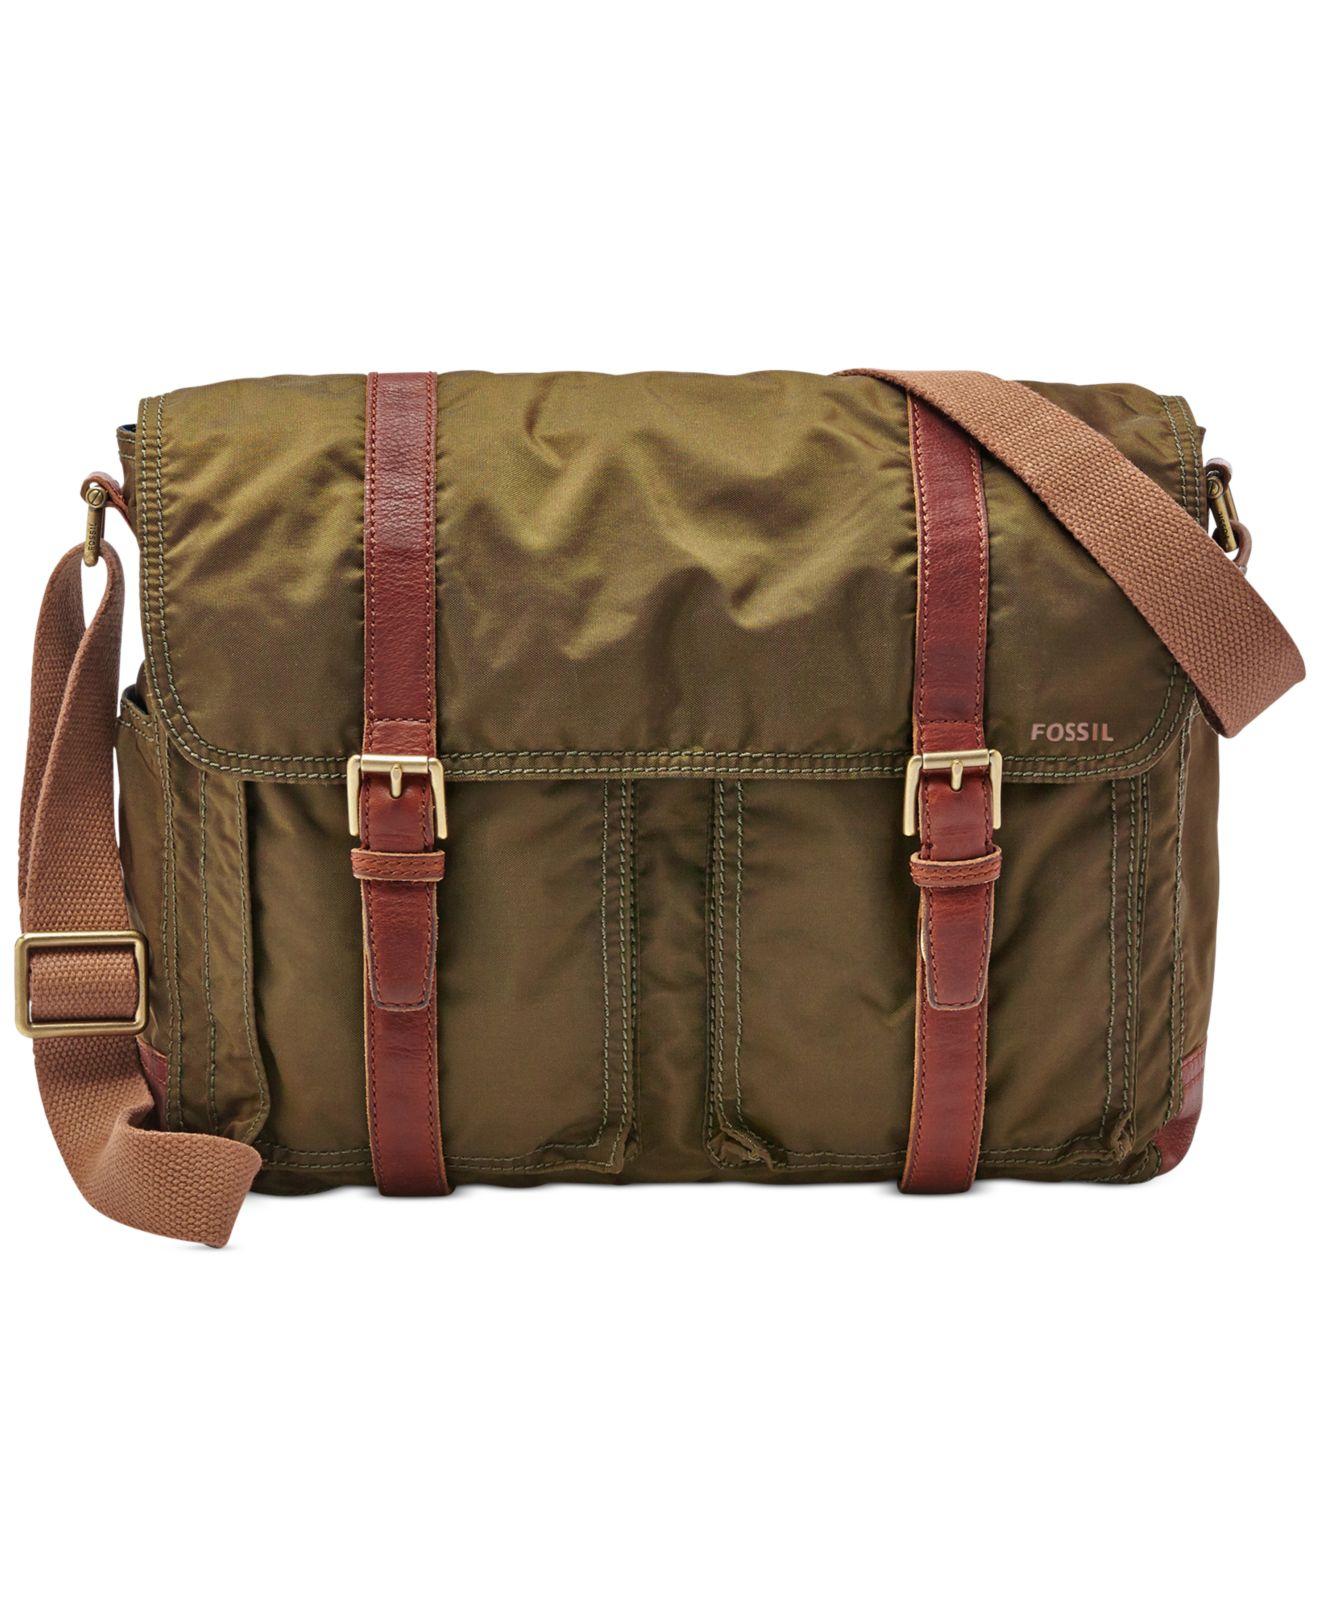 fossil estate messenger bag review